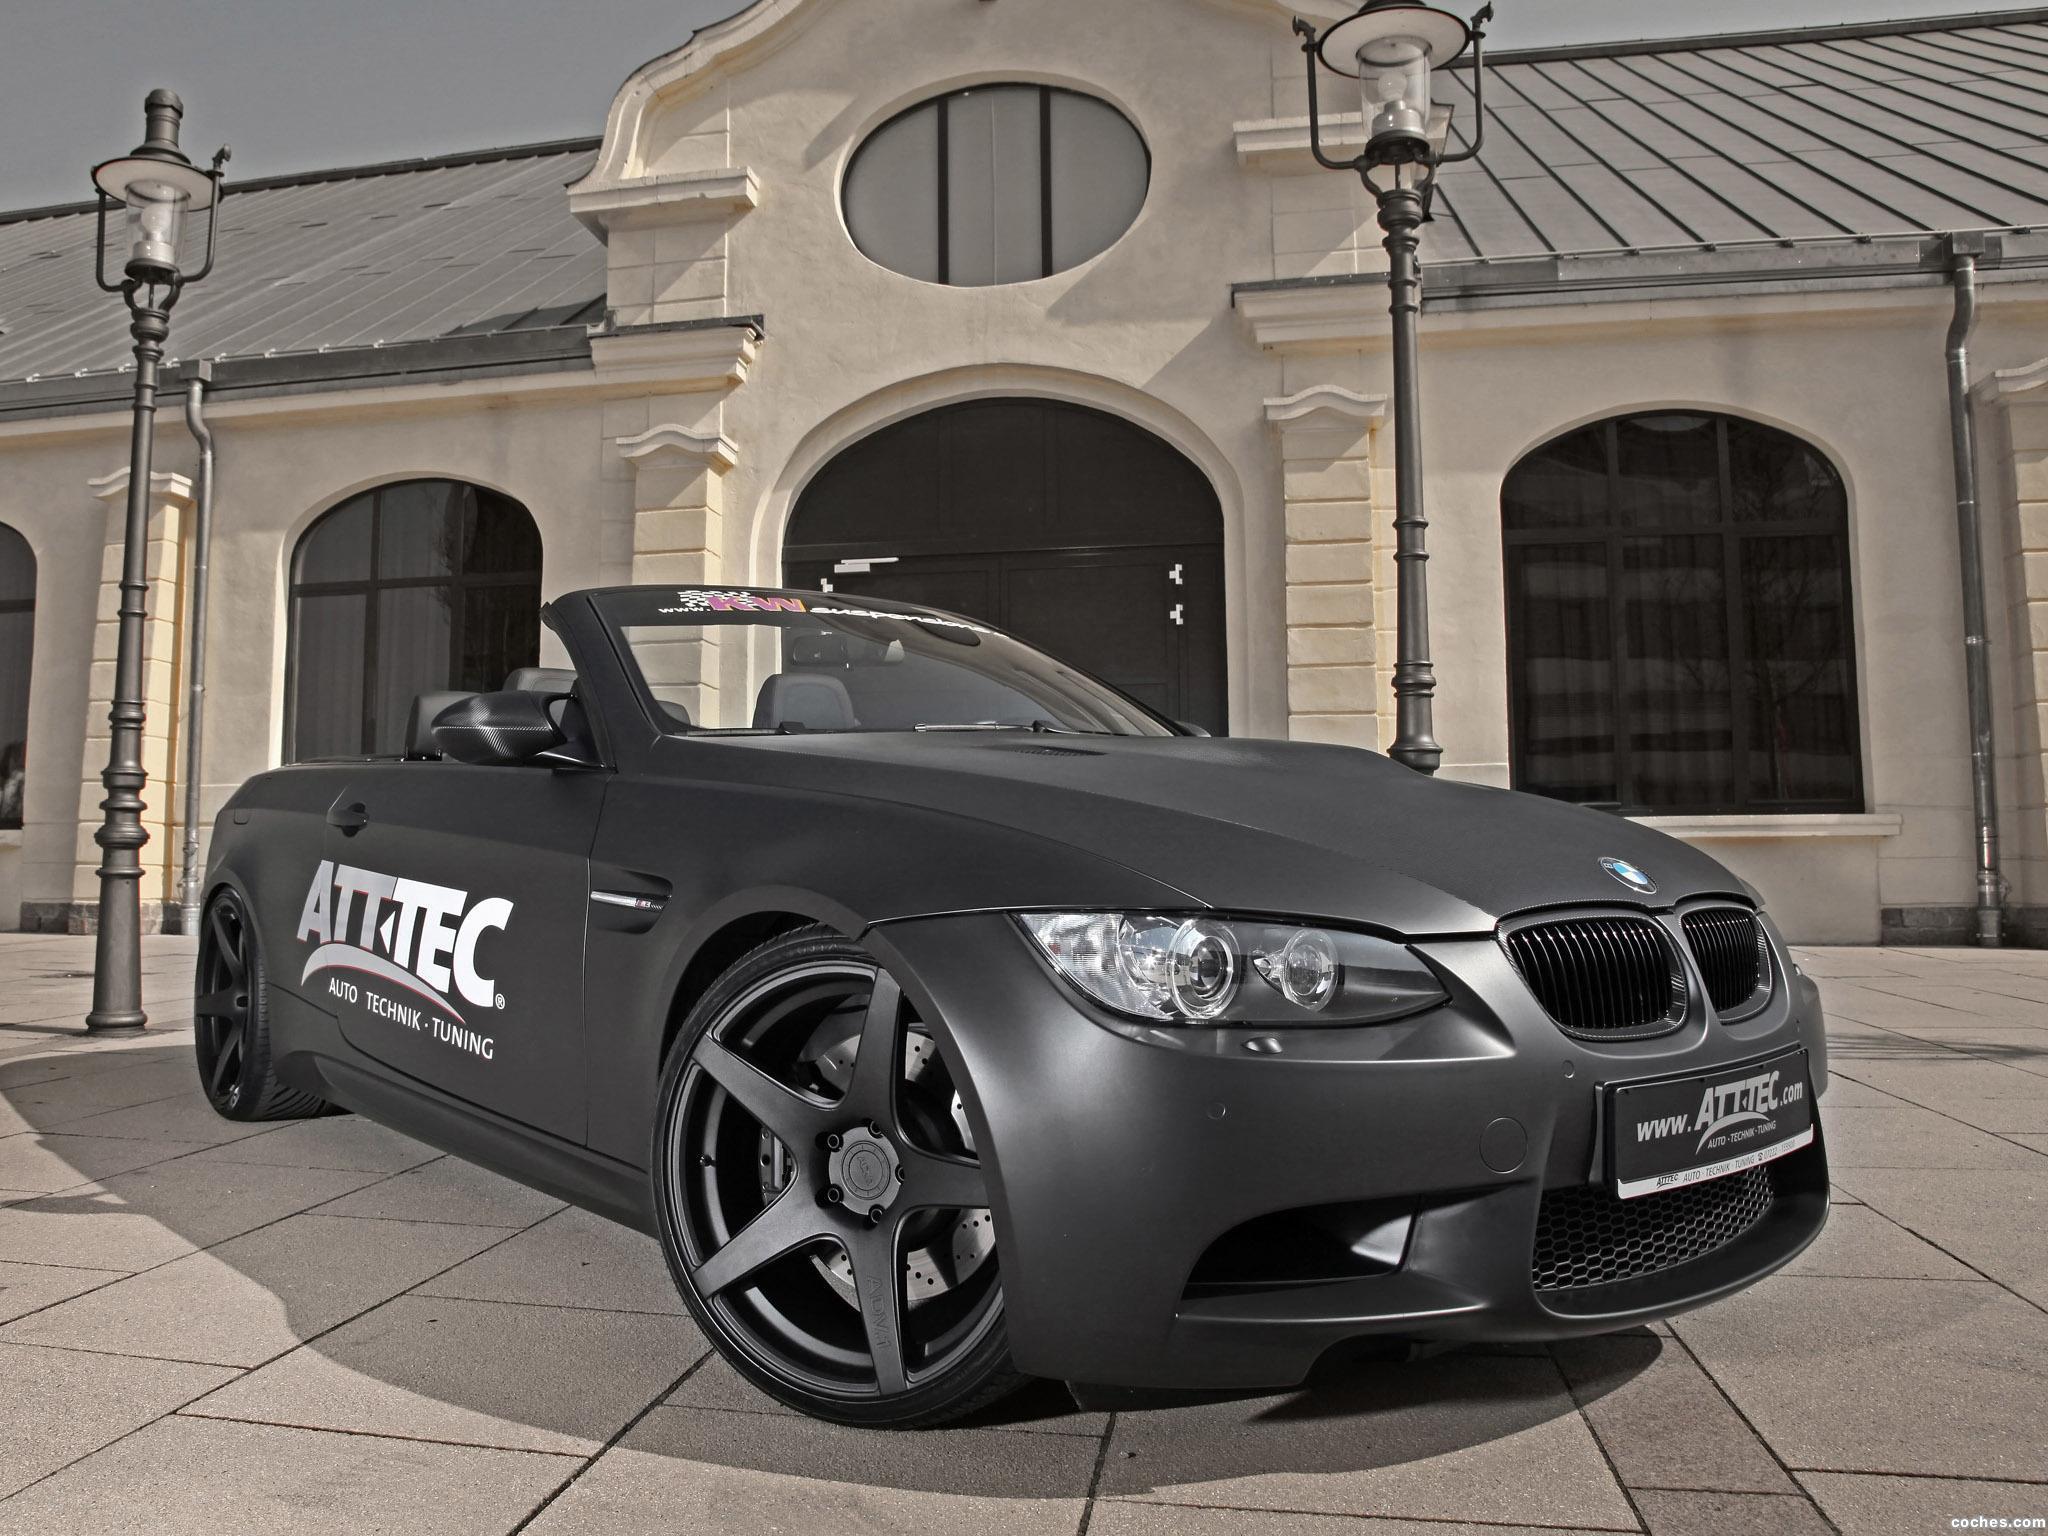 Foto 0 de BMW ATT TEC M3 Cabrio 2012